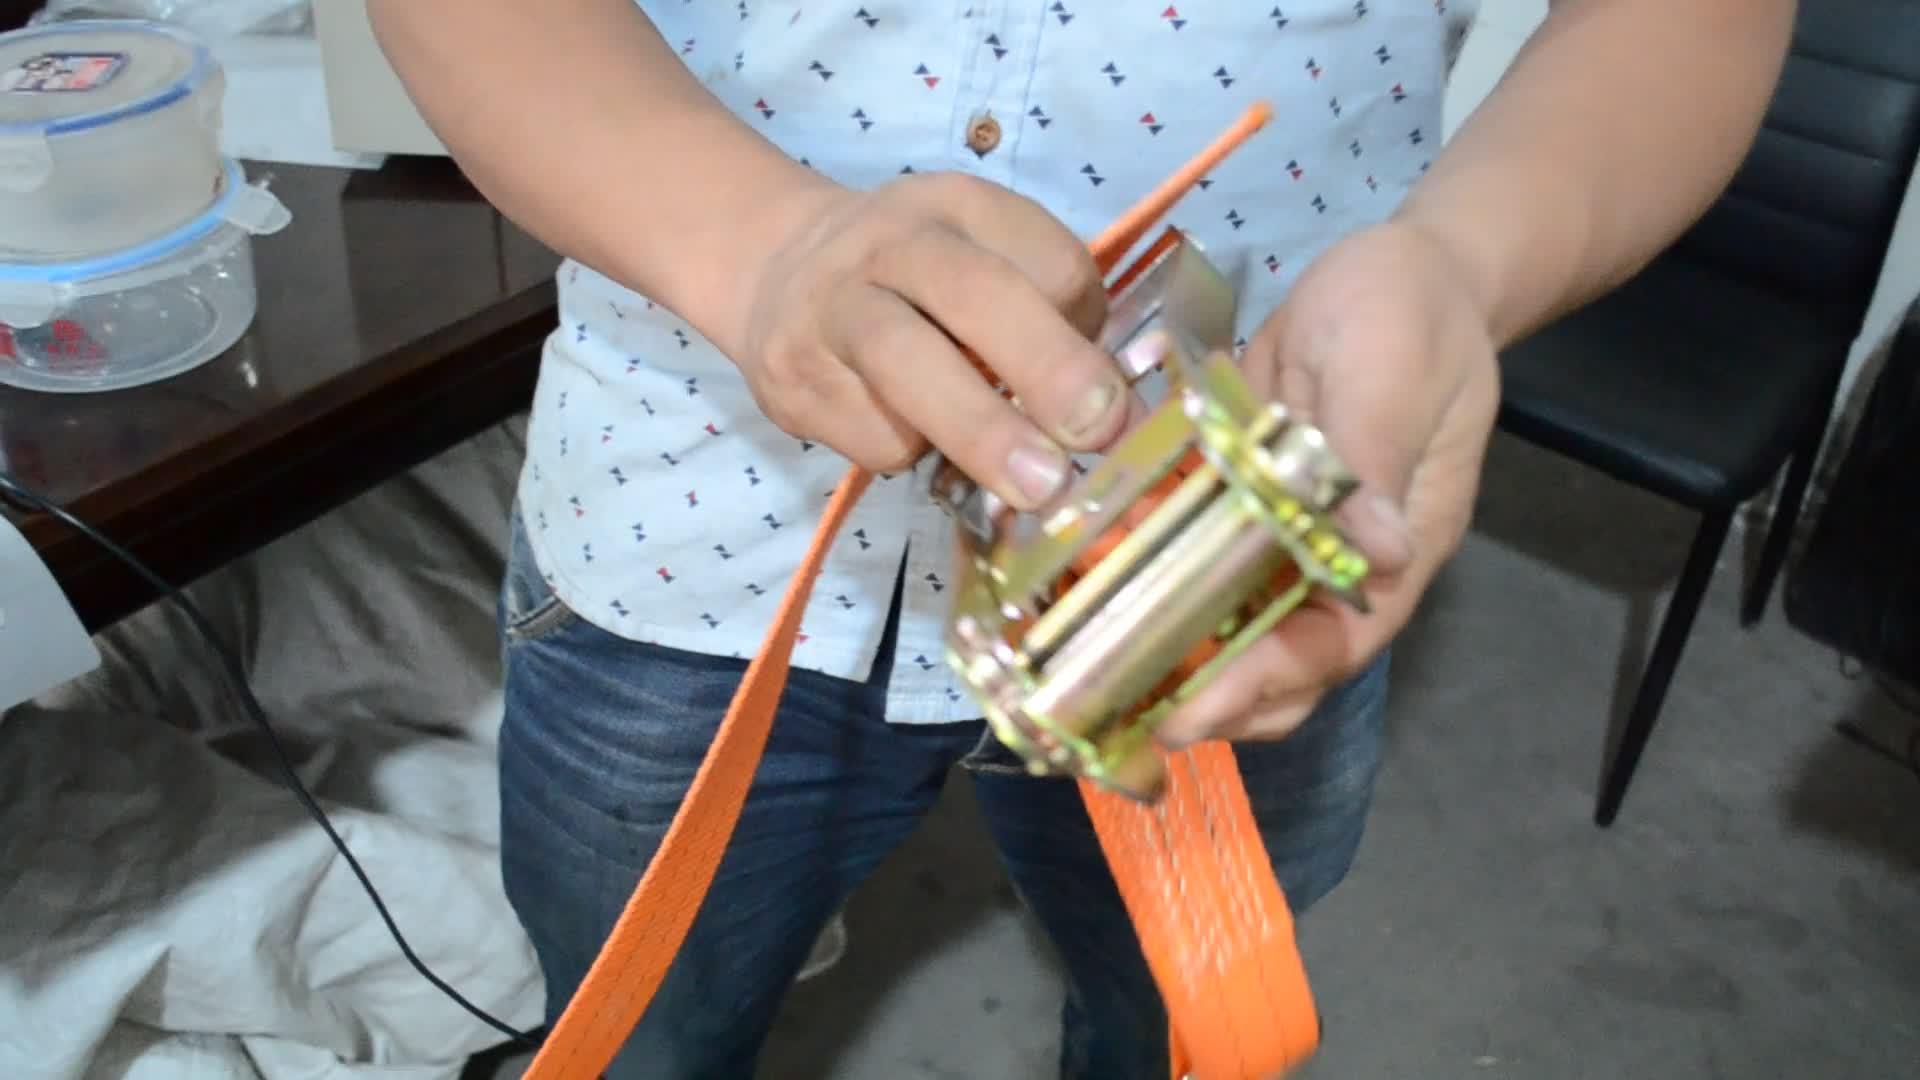 50mm 10m tuv เชือก,tow hook สายคล้อง 4 ตัน,ratchet rope สีเหลืองรถ tow สาย